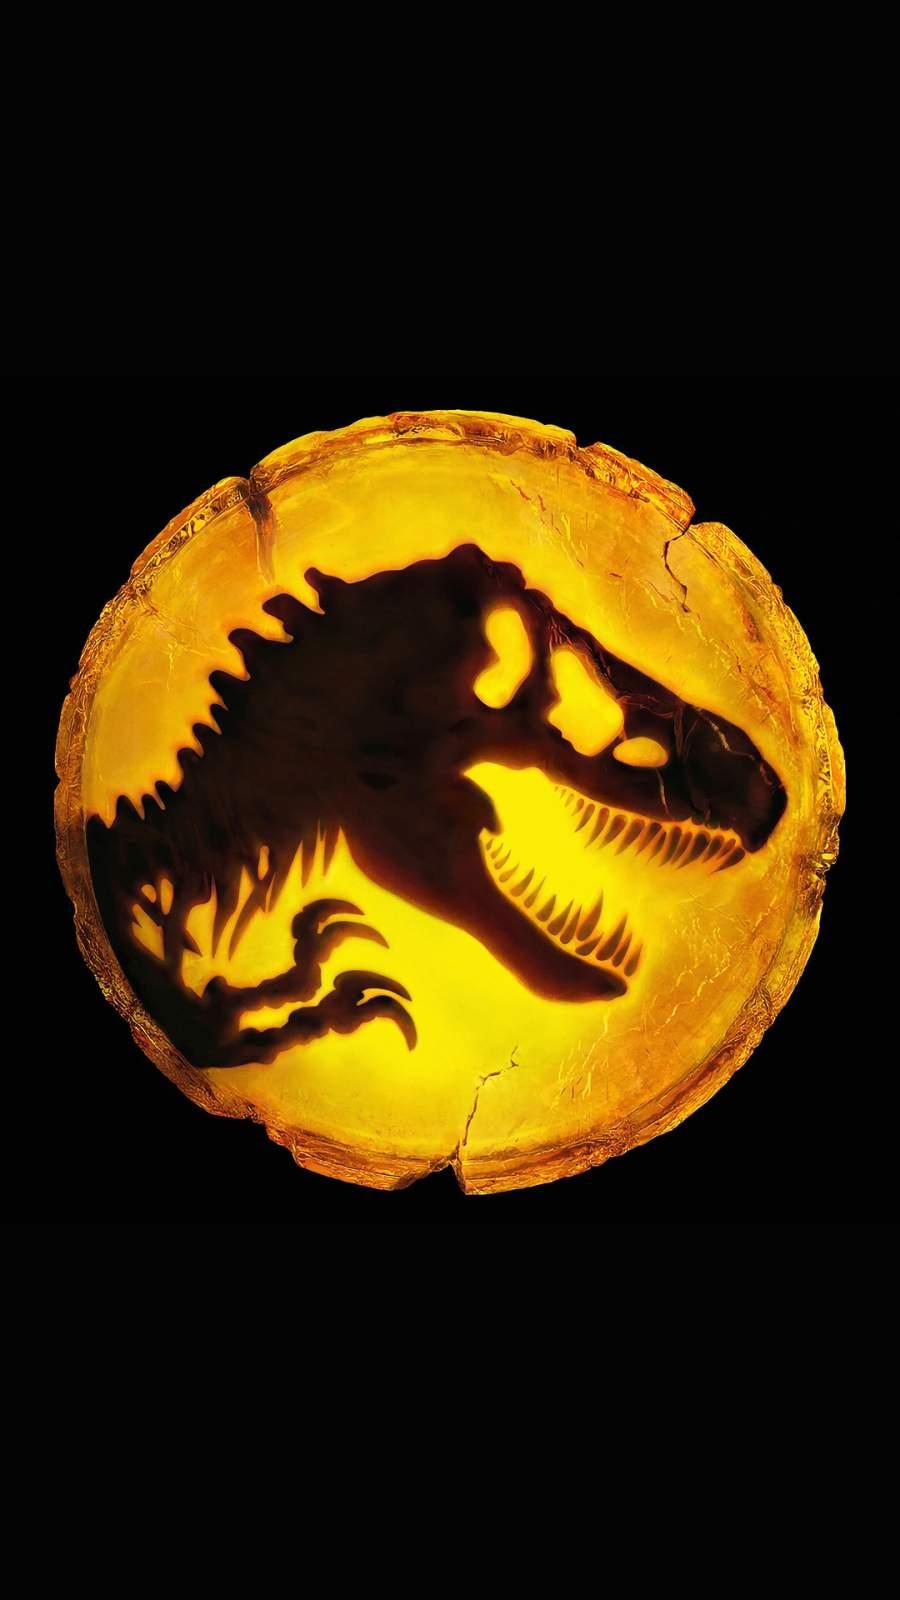 Jurassic World iPhone Wallpaper